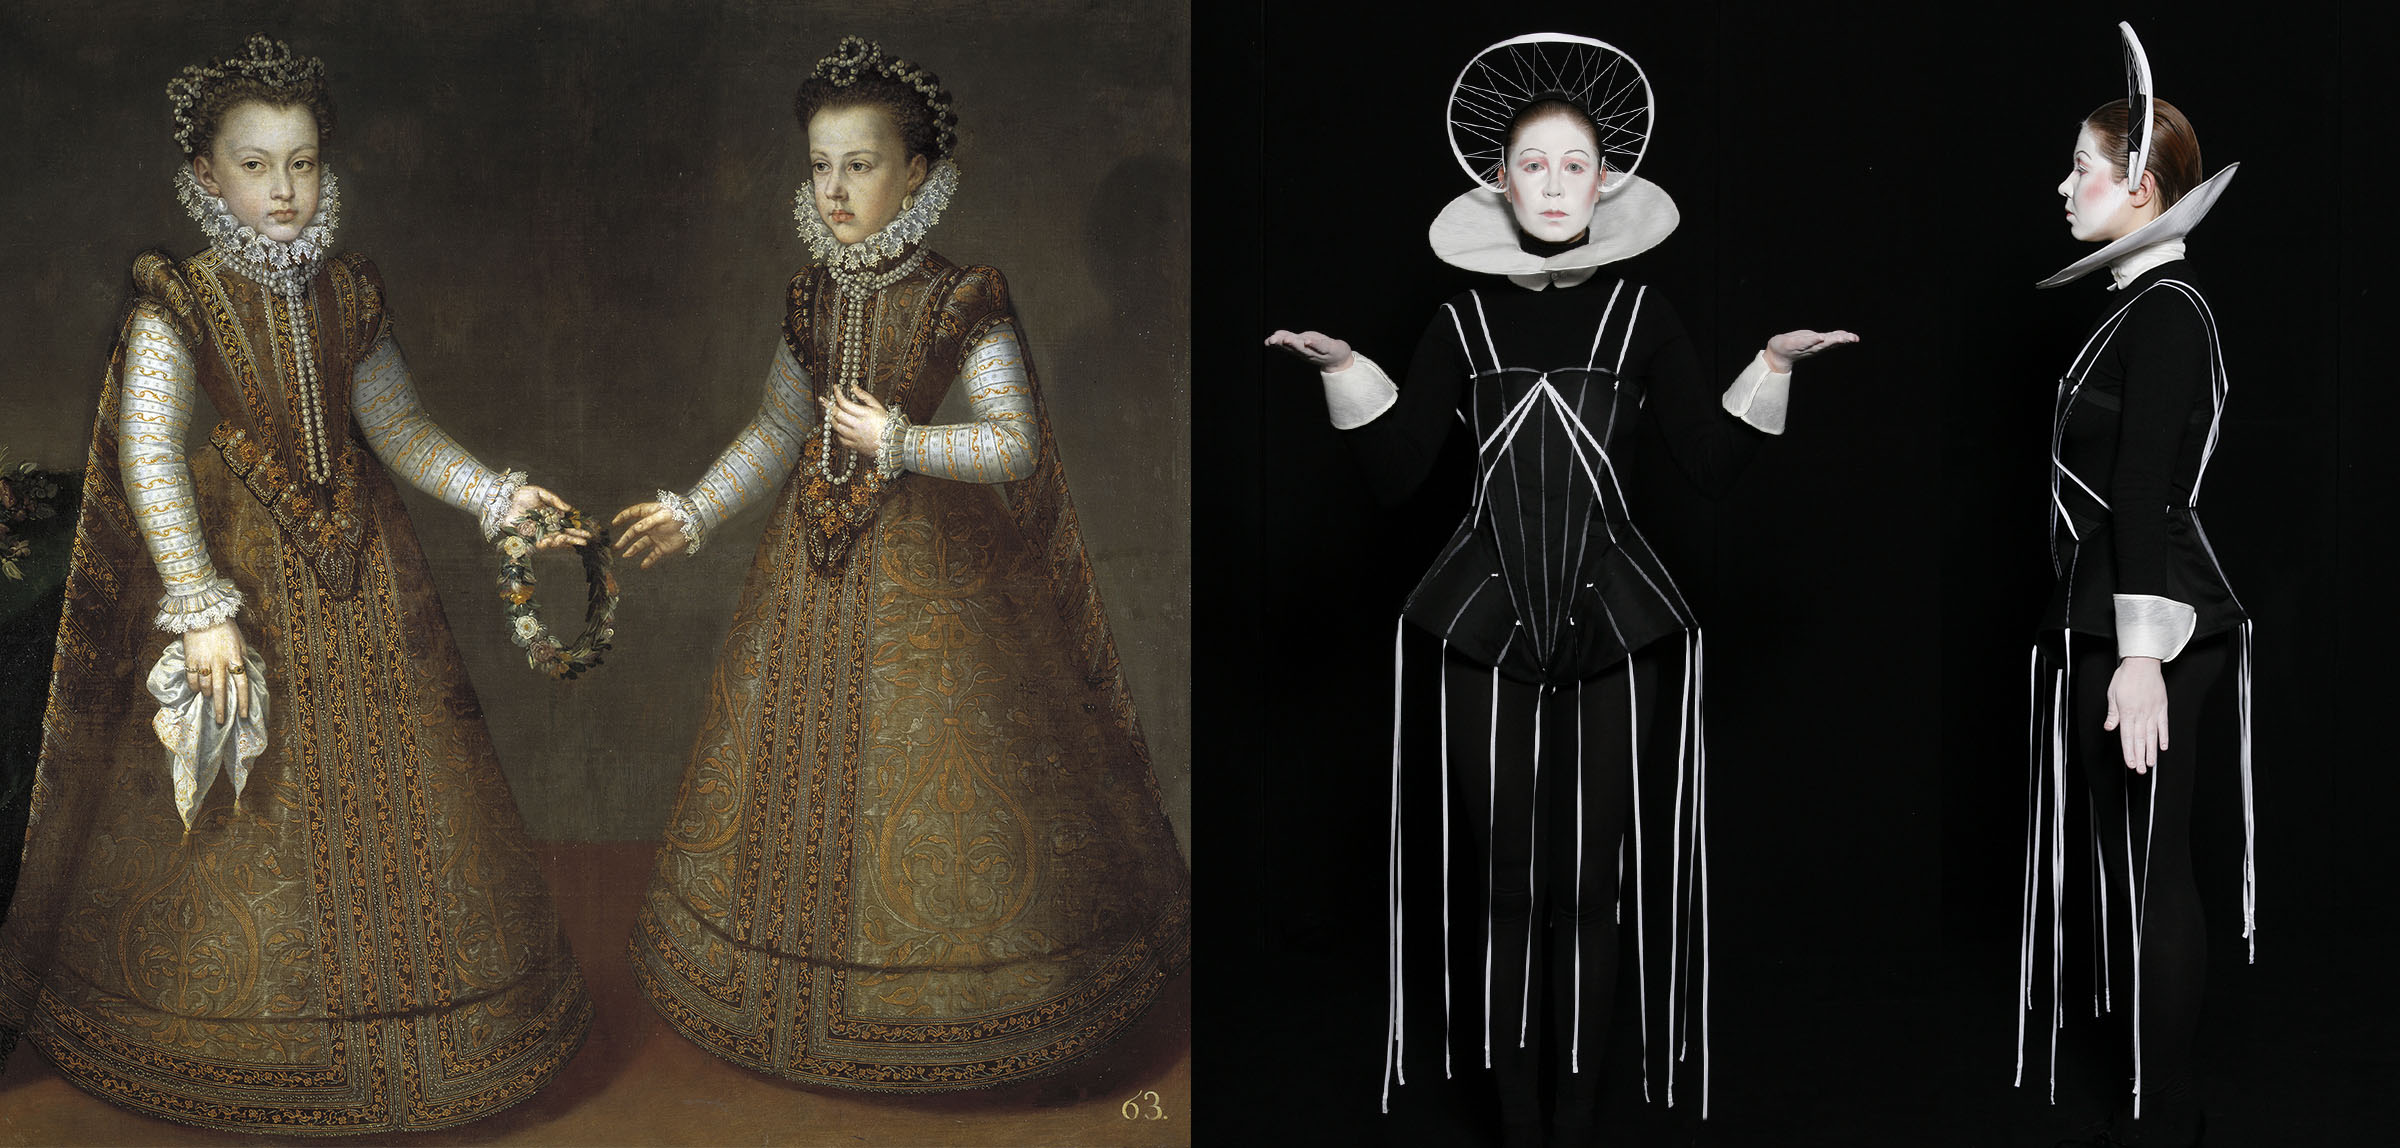 Sanchez Coello – Infanta Isabel Clara Eugenia 3 a